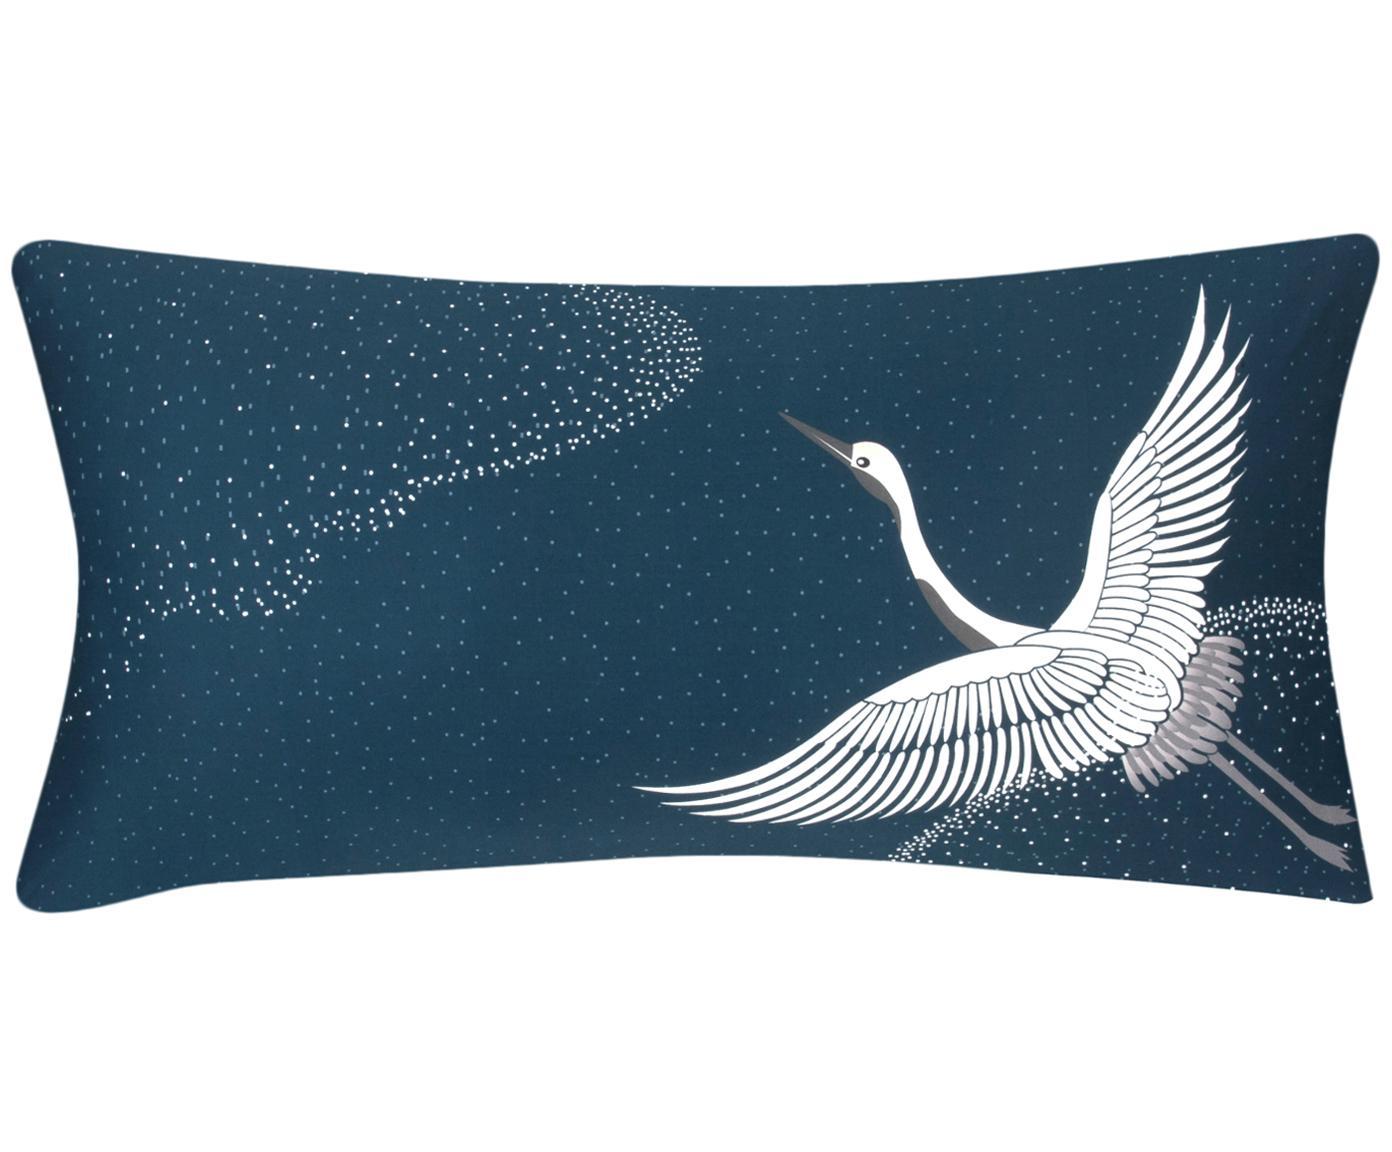 Baumwollsatin-Kissenbezüge Yuma mit Kranichmotiv, 2 Stück, Webart: Satin Fadendichte 210 TC,, Blau, Weiß, Grau, 40 x 80 cm